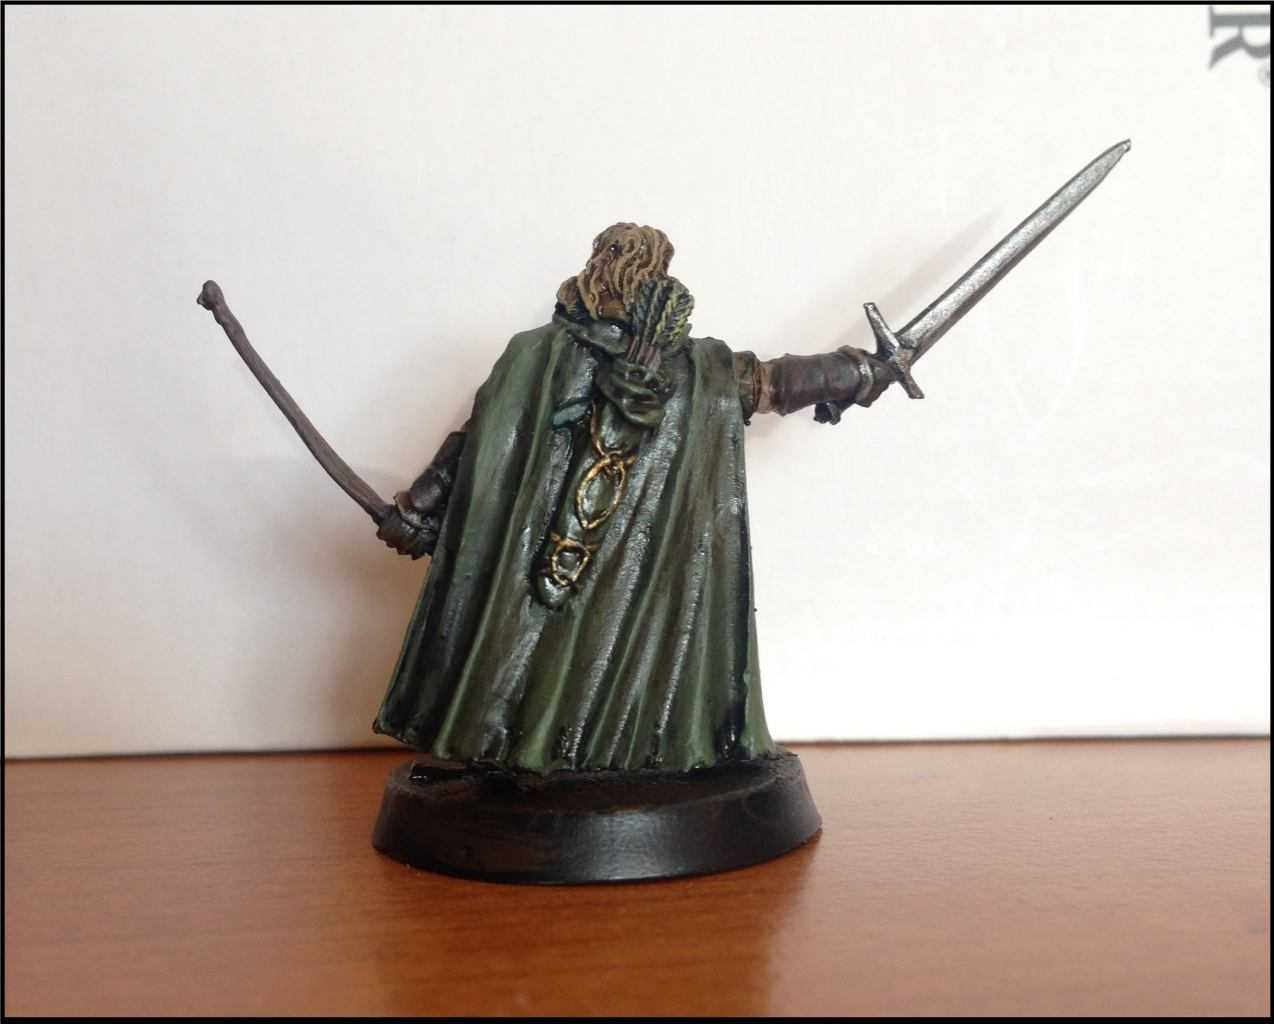 Come dipingere miniature Games Workshop - Tutorial 25: Faramir